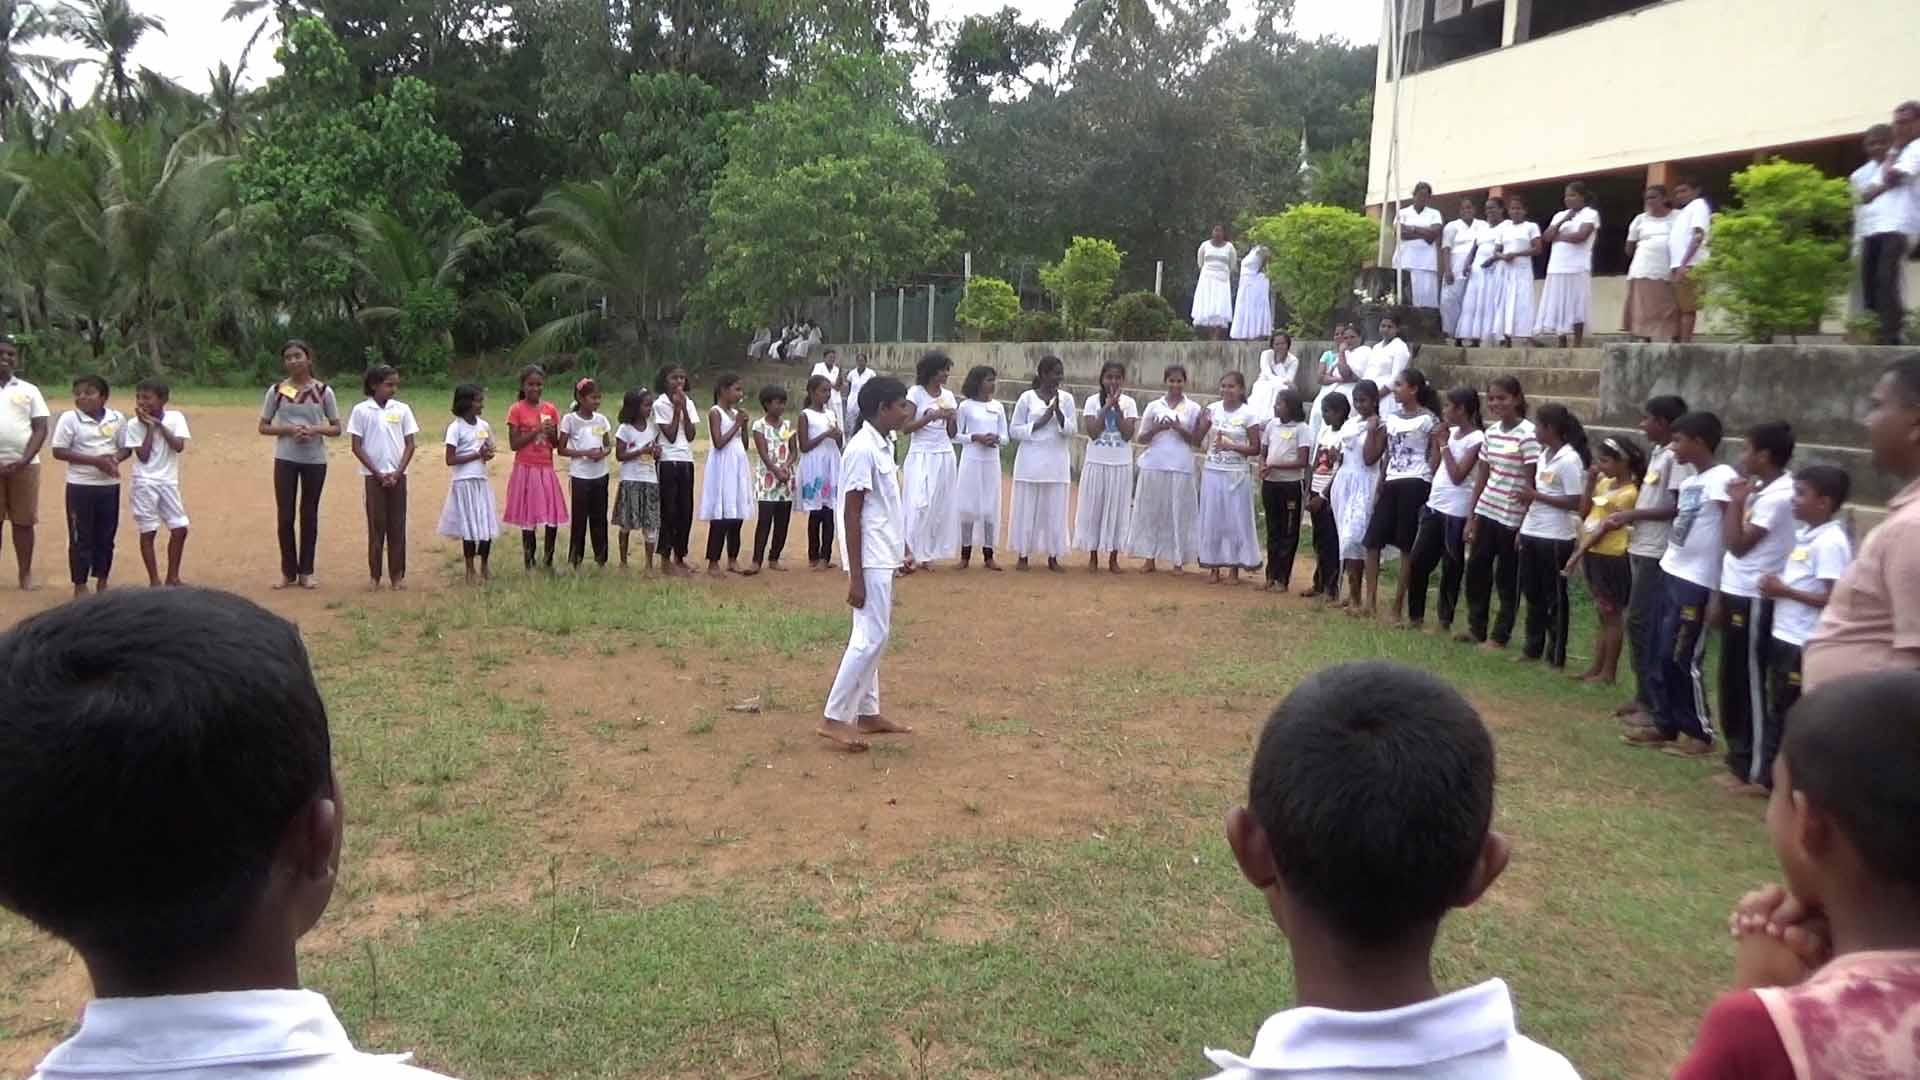 Sati Pasala Mindfulness Camp at Meethirigala Kanishta Vidyalaya-scouting activities (7)